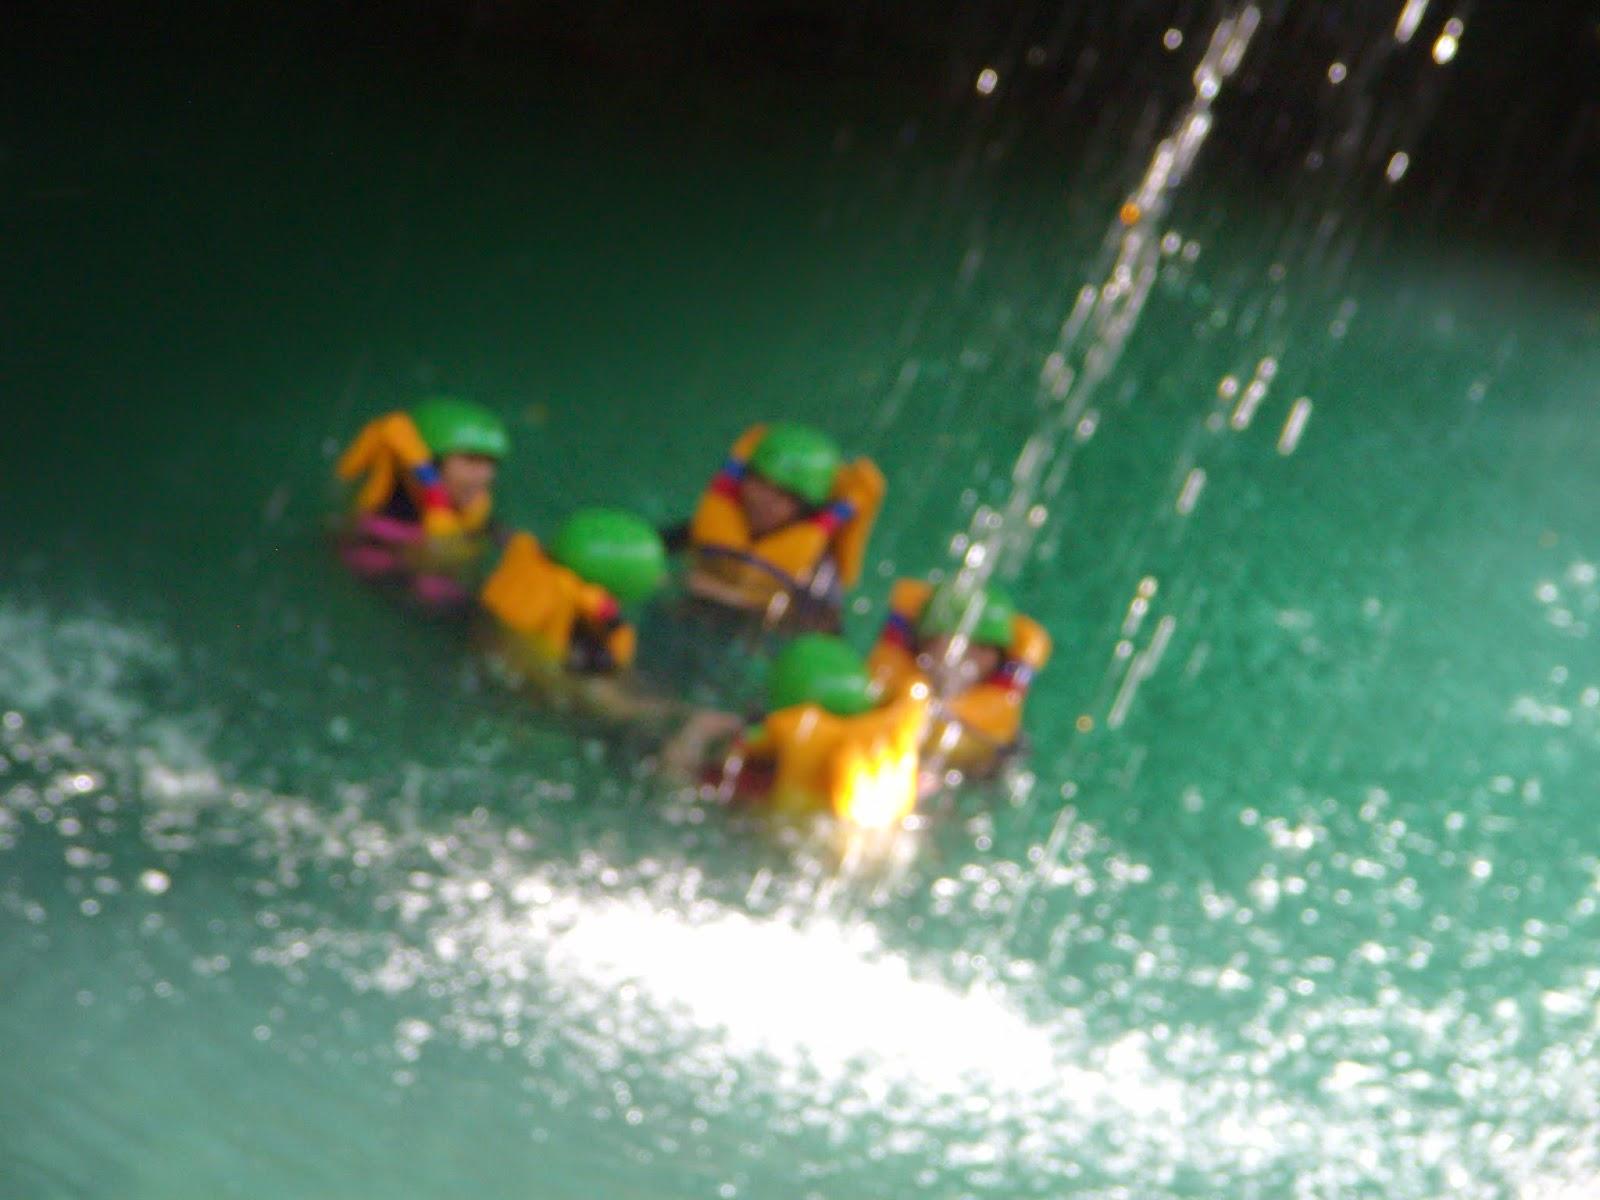 pohoto-phpto,Citumang, Body rafting Pangandaran, Body rafting Citumang, Citumang Pangandaran,